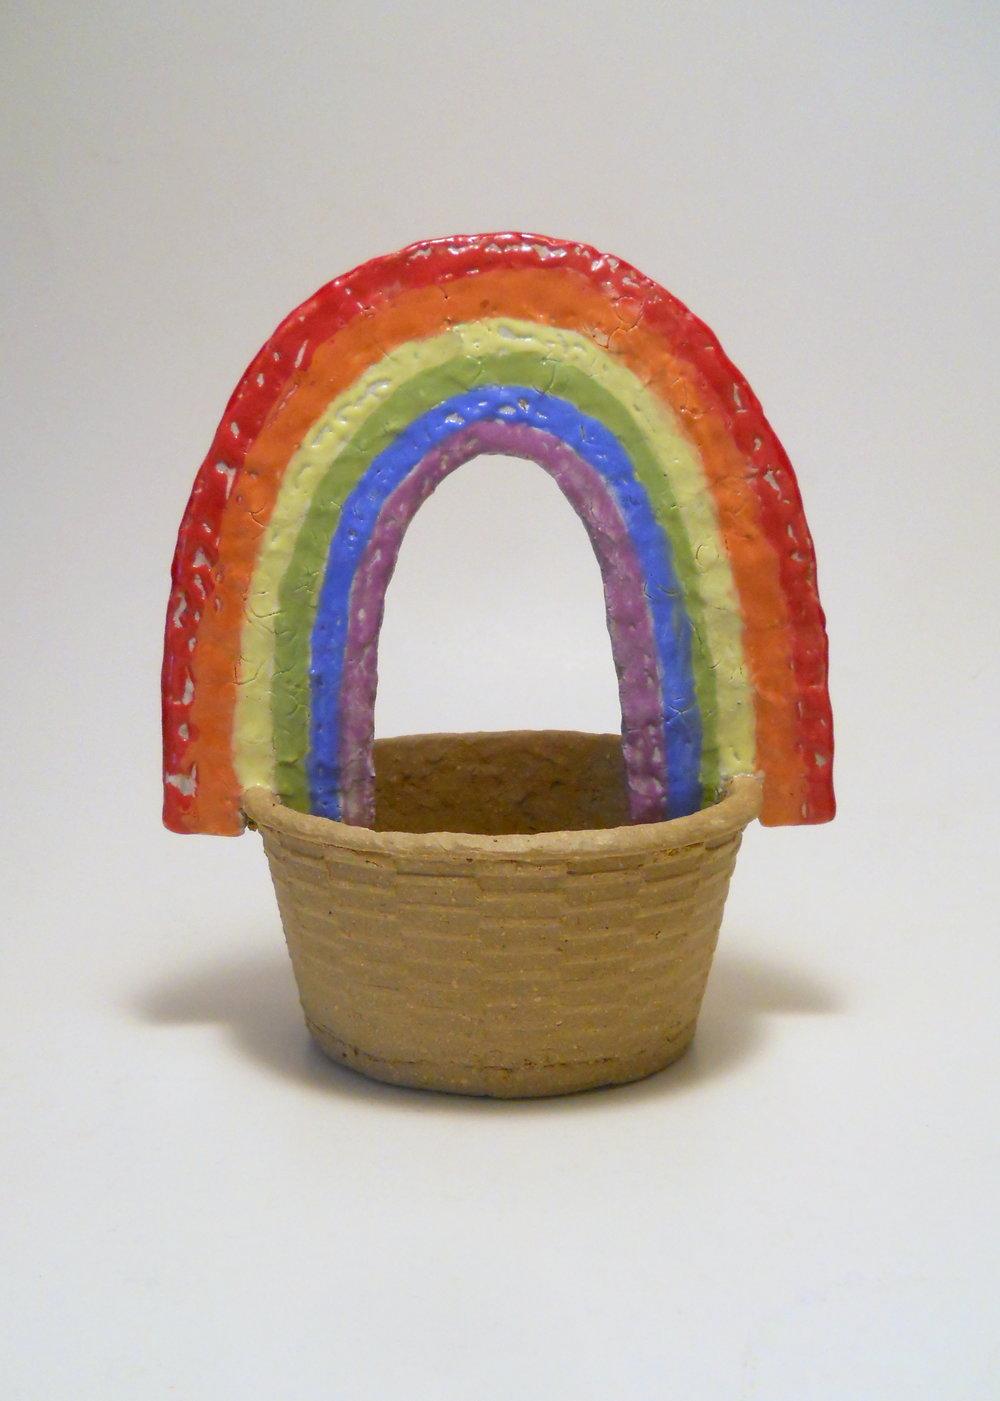 Rainbow Cheese Basket